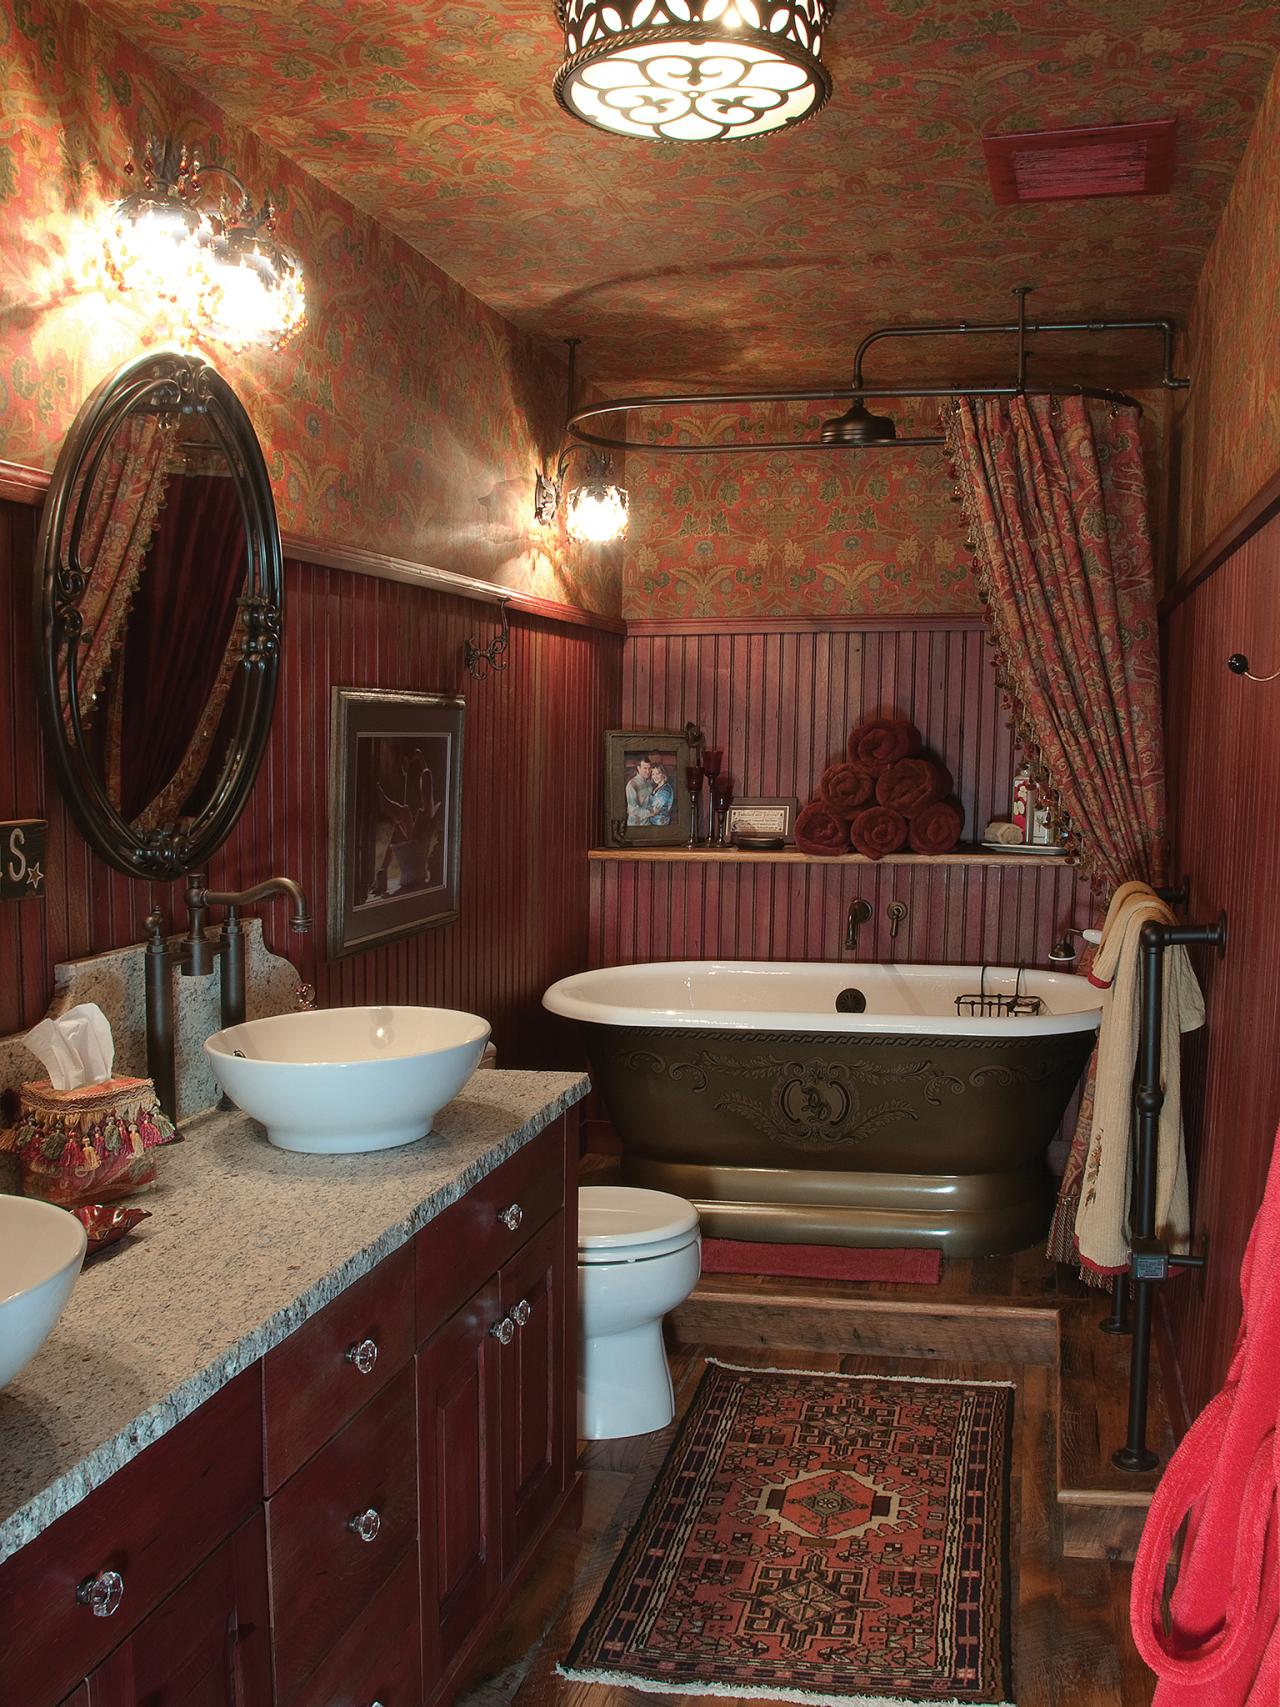 European Bathroom Design Ideas: HGTV Pictures & Tips | HGTV